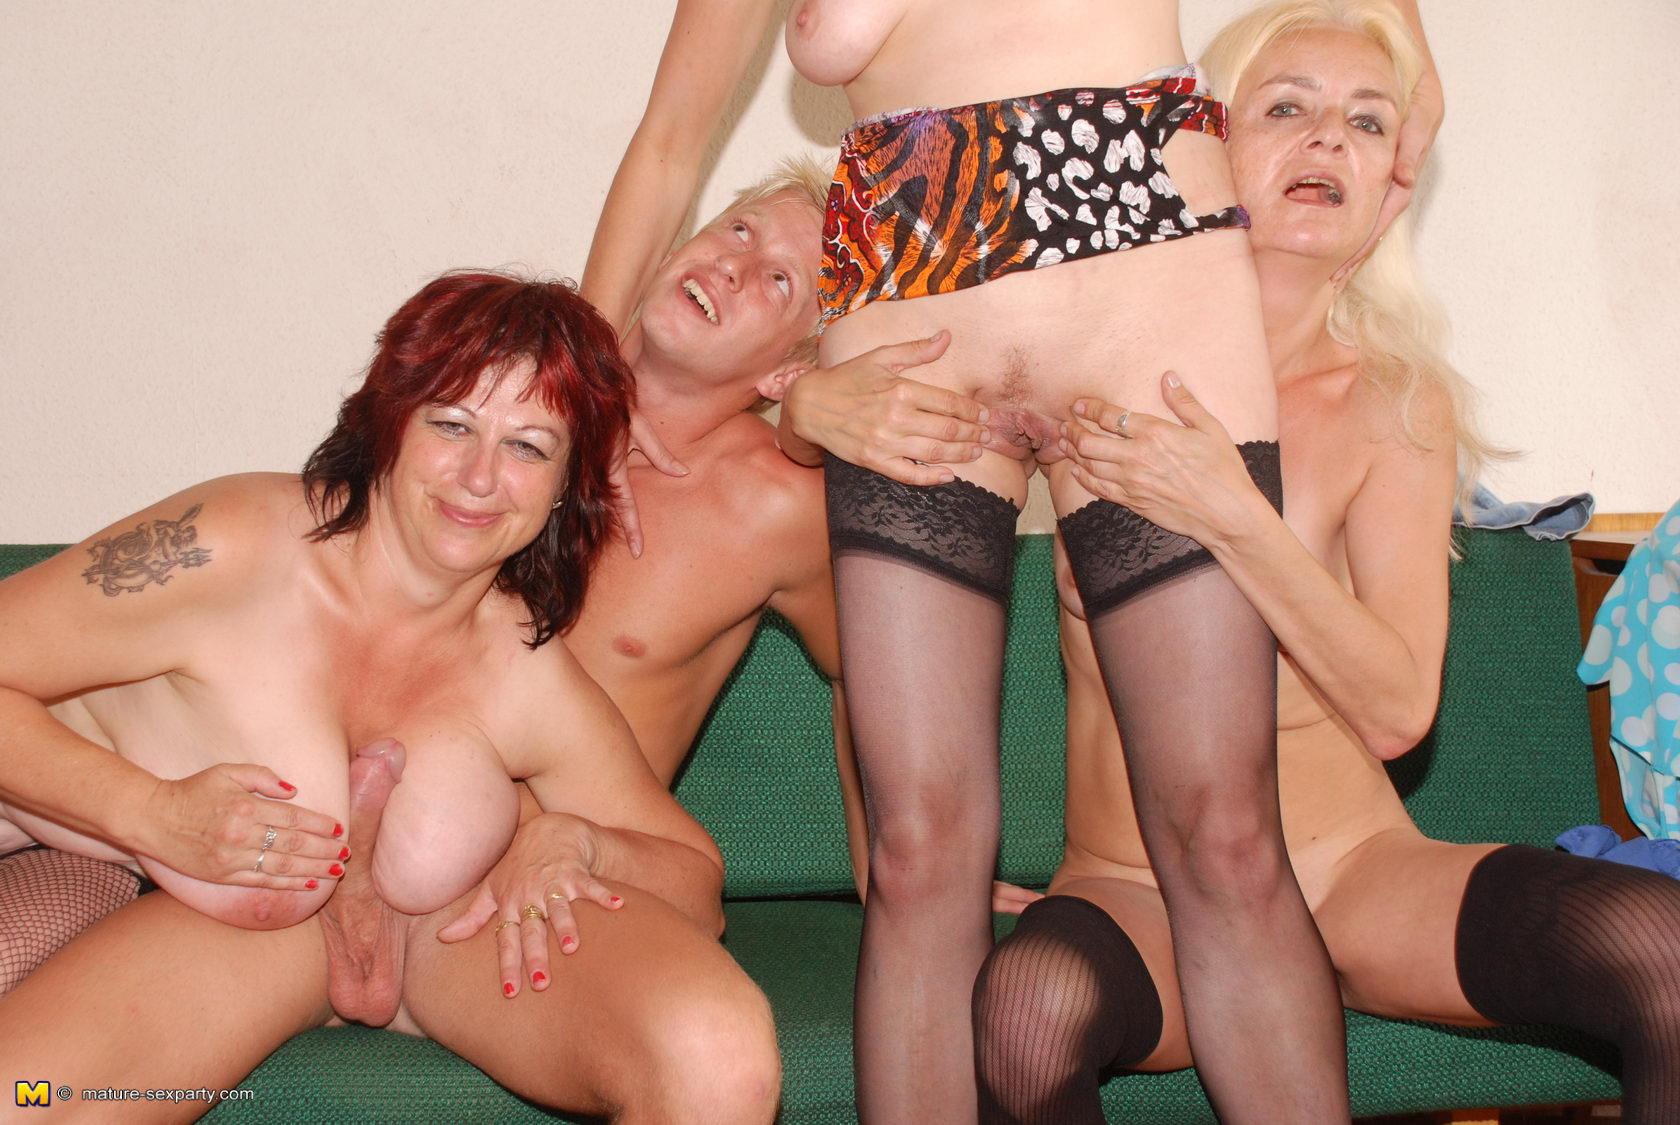 Порно фото галереи старушек с молодыми парнями, тина канделаки порно фото